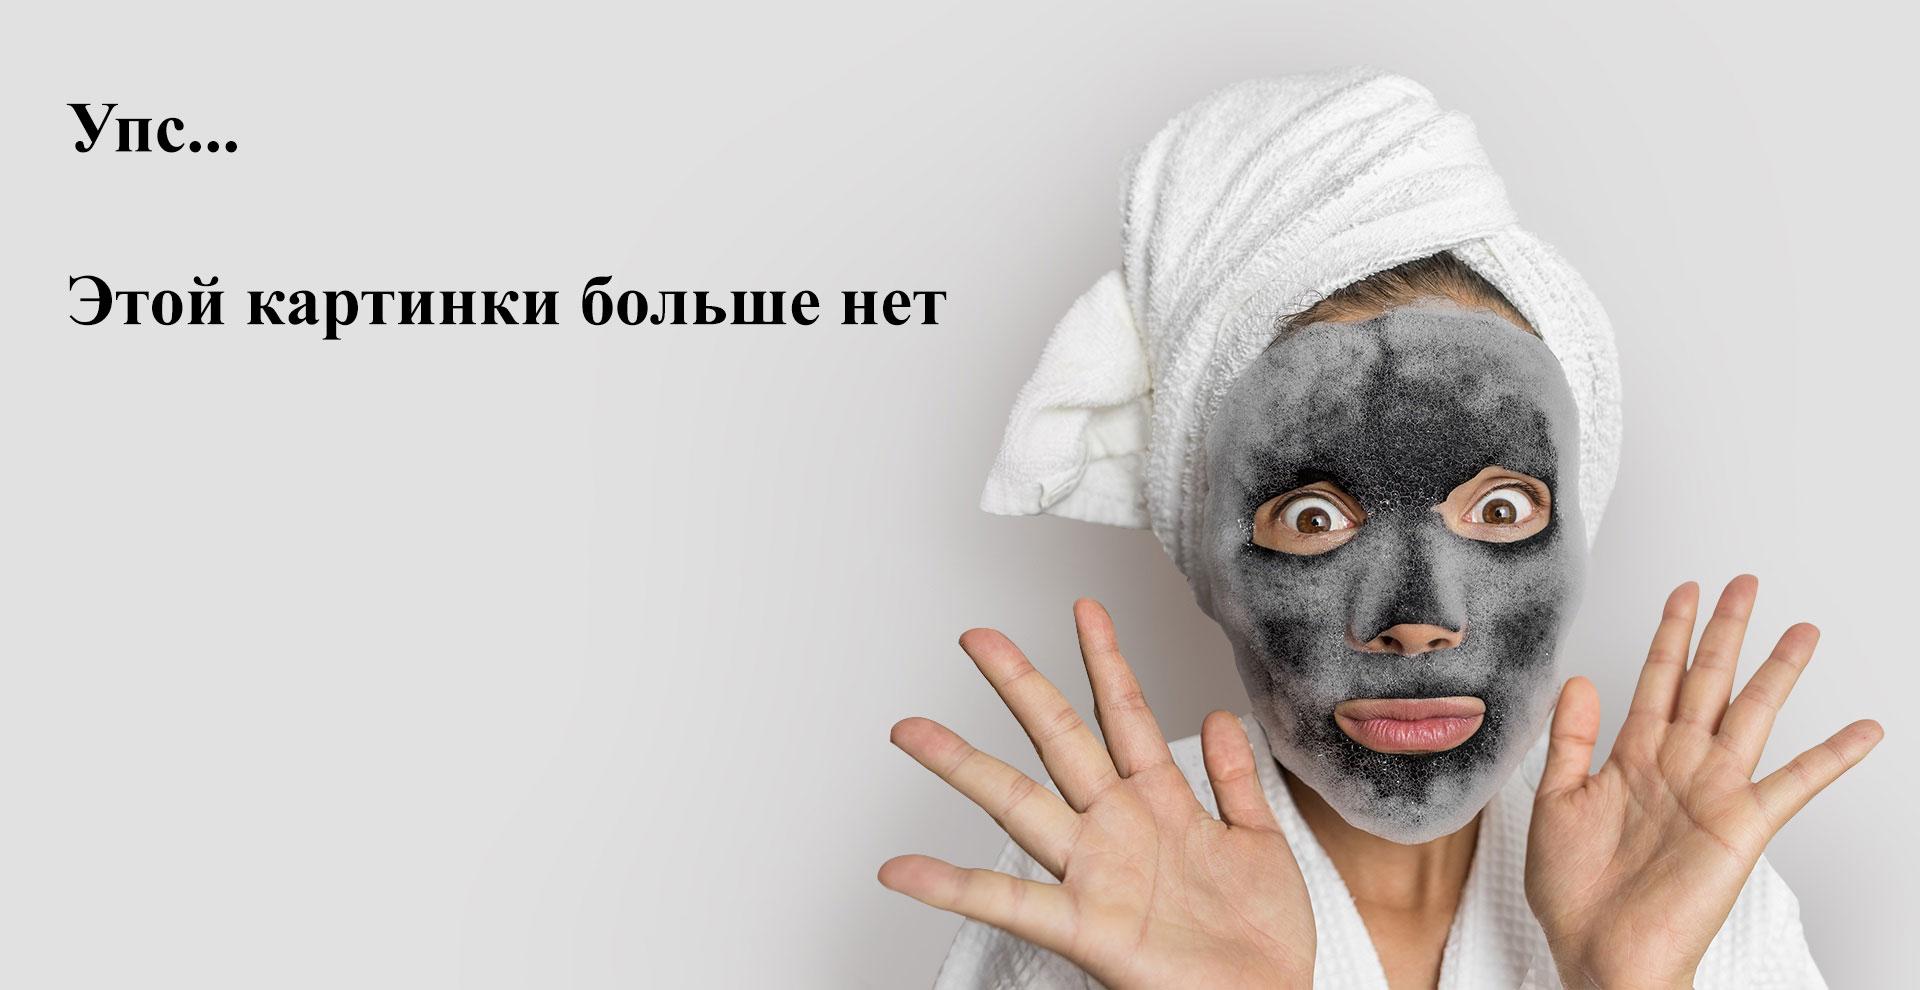 Siberina, Пена для ванны «Роза», 250 мл